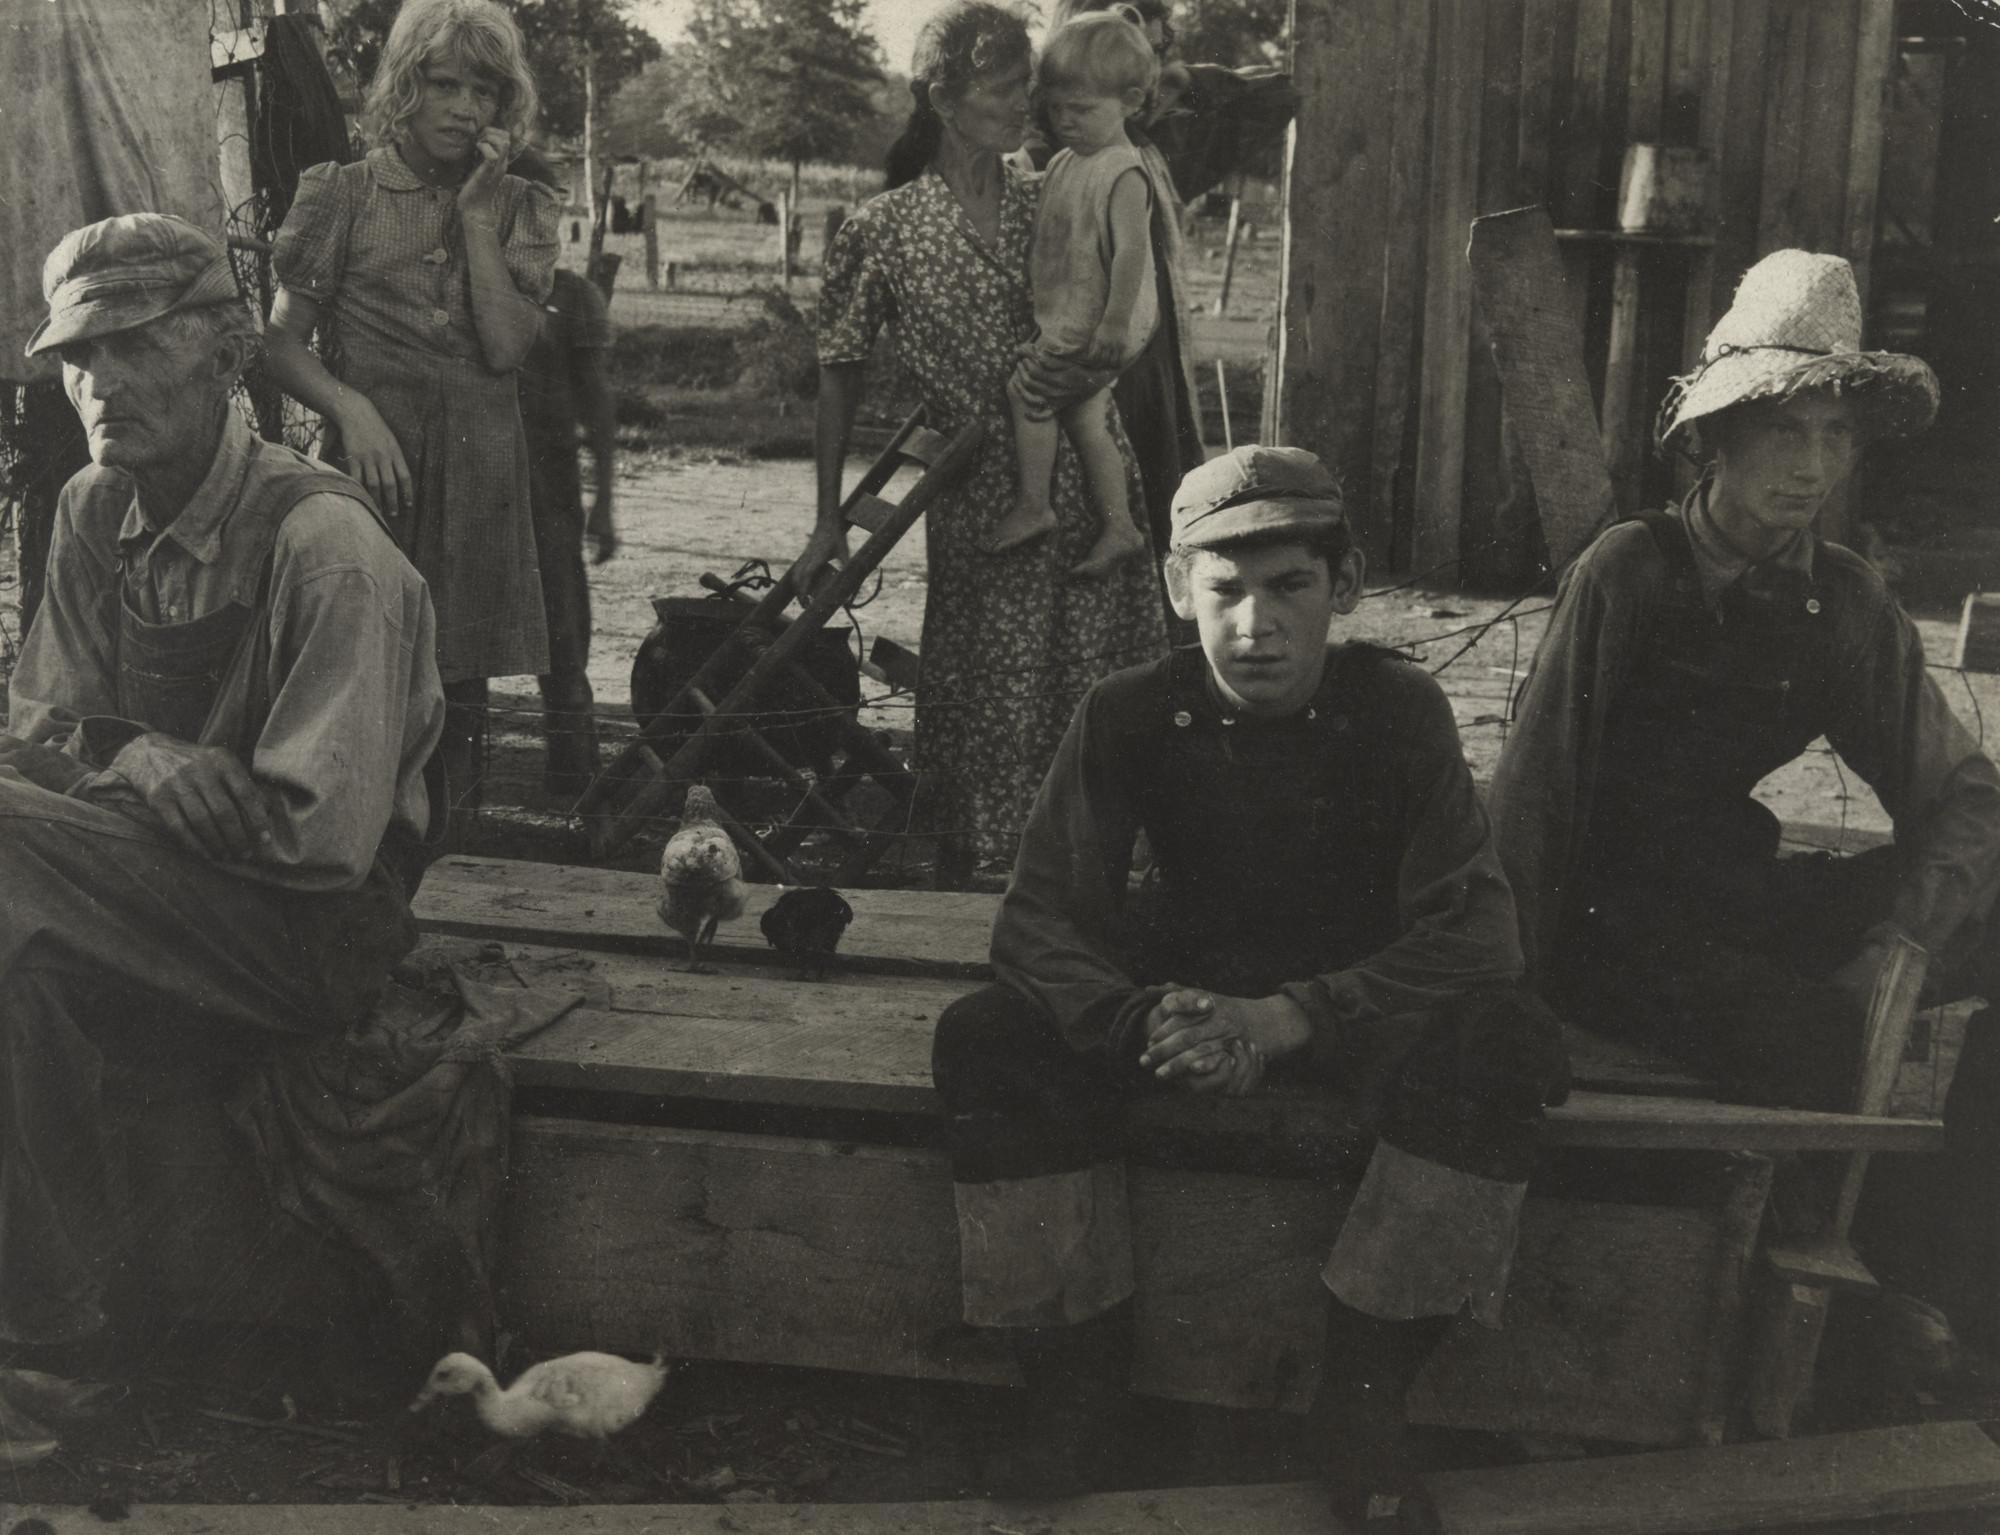 Sid Grossman作品Snyder Family, Missouri 1940。(取自MoMA官網)